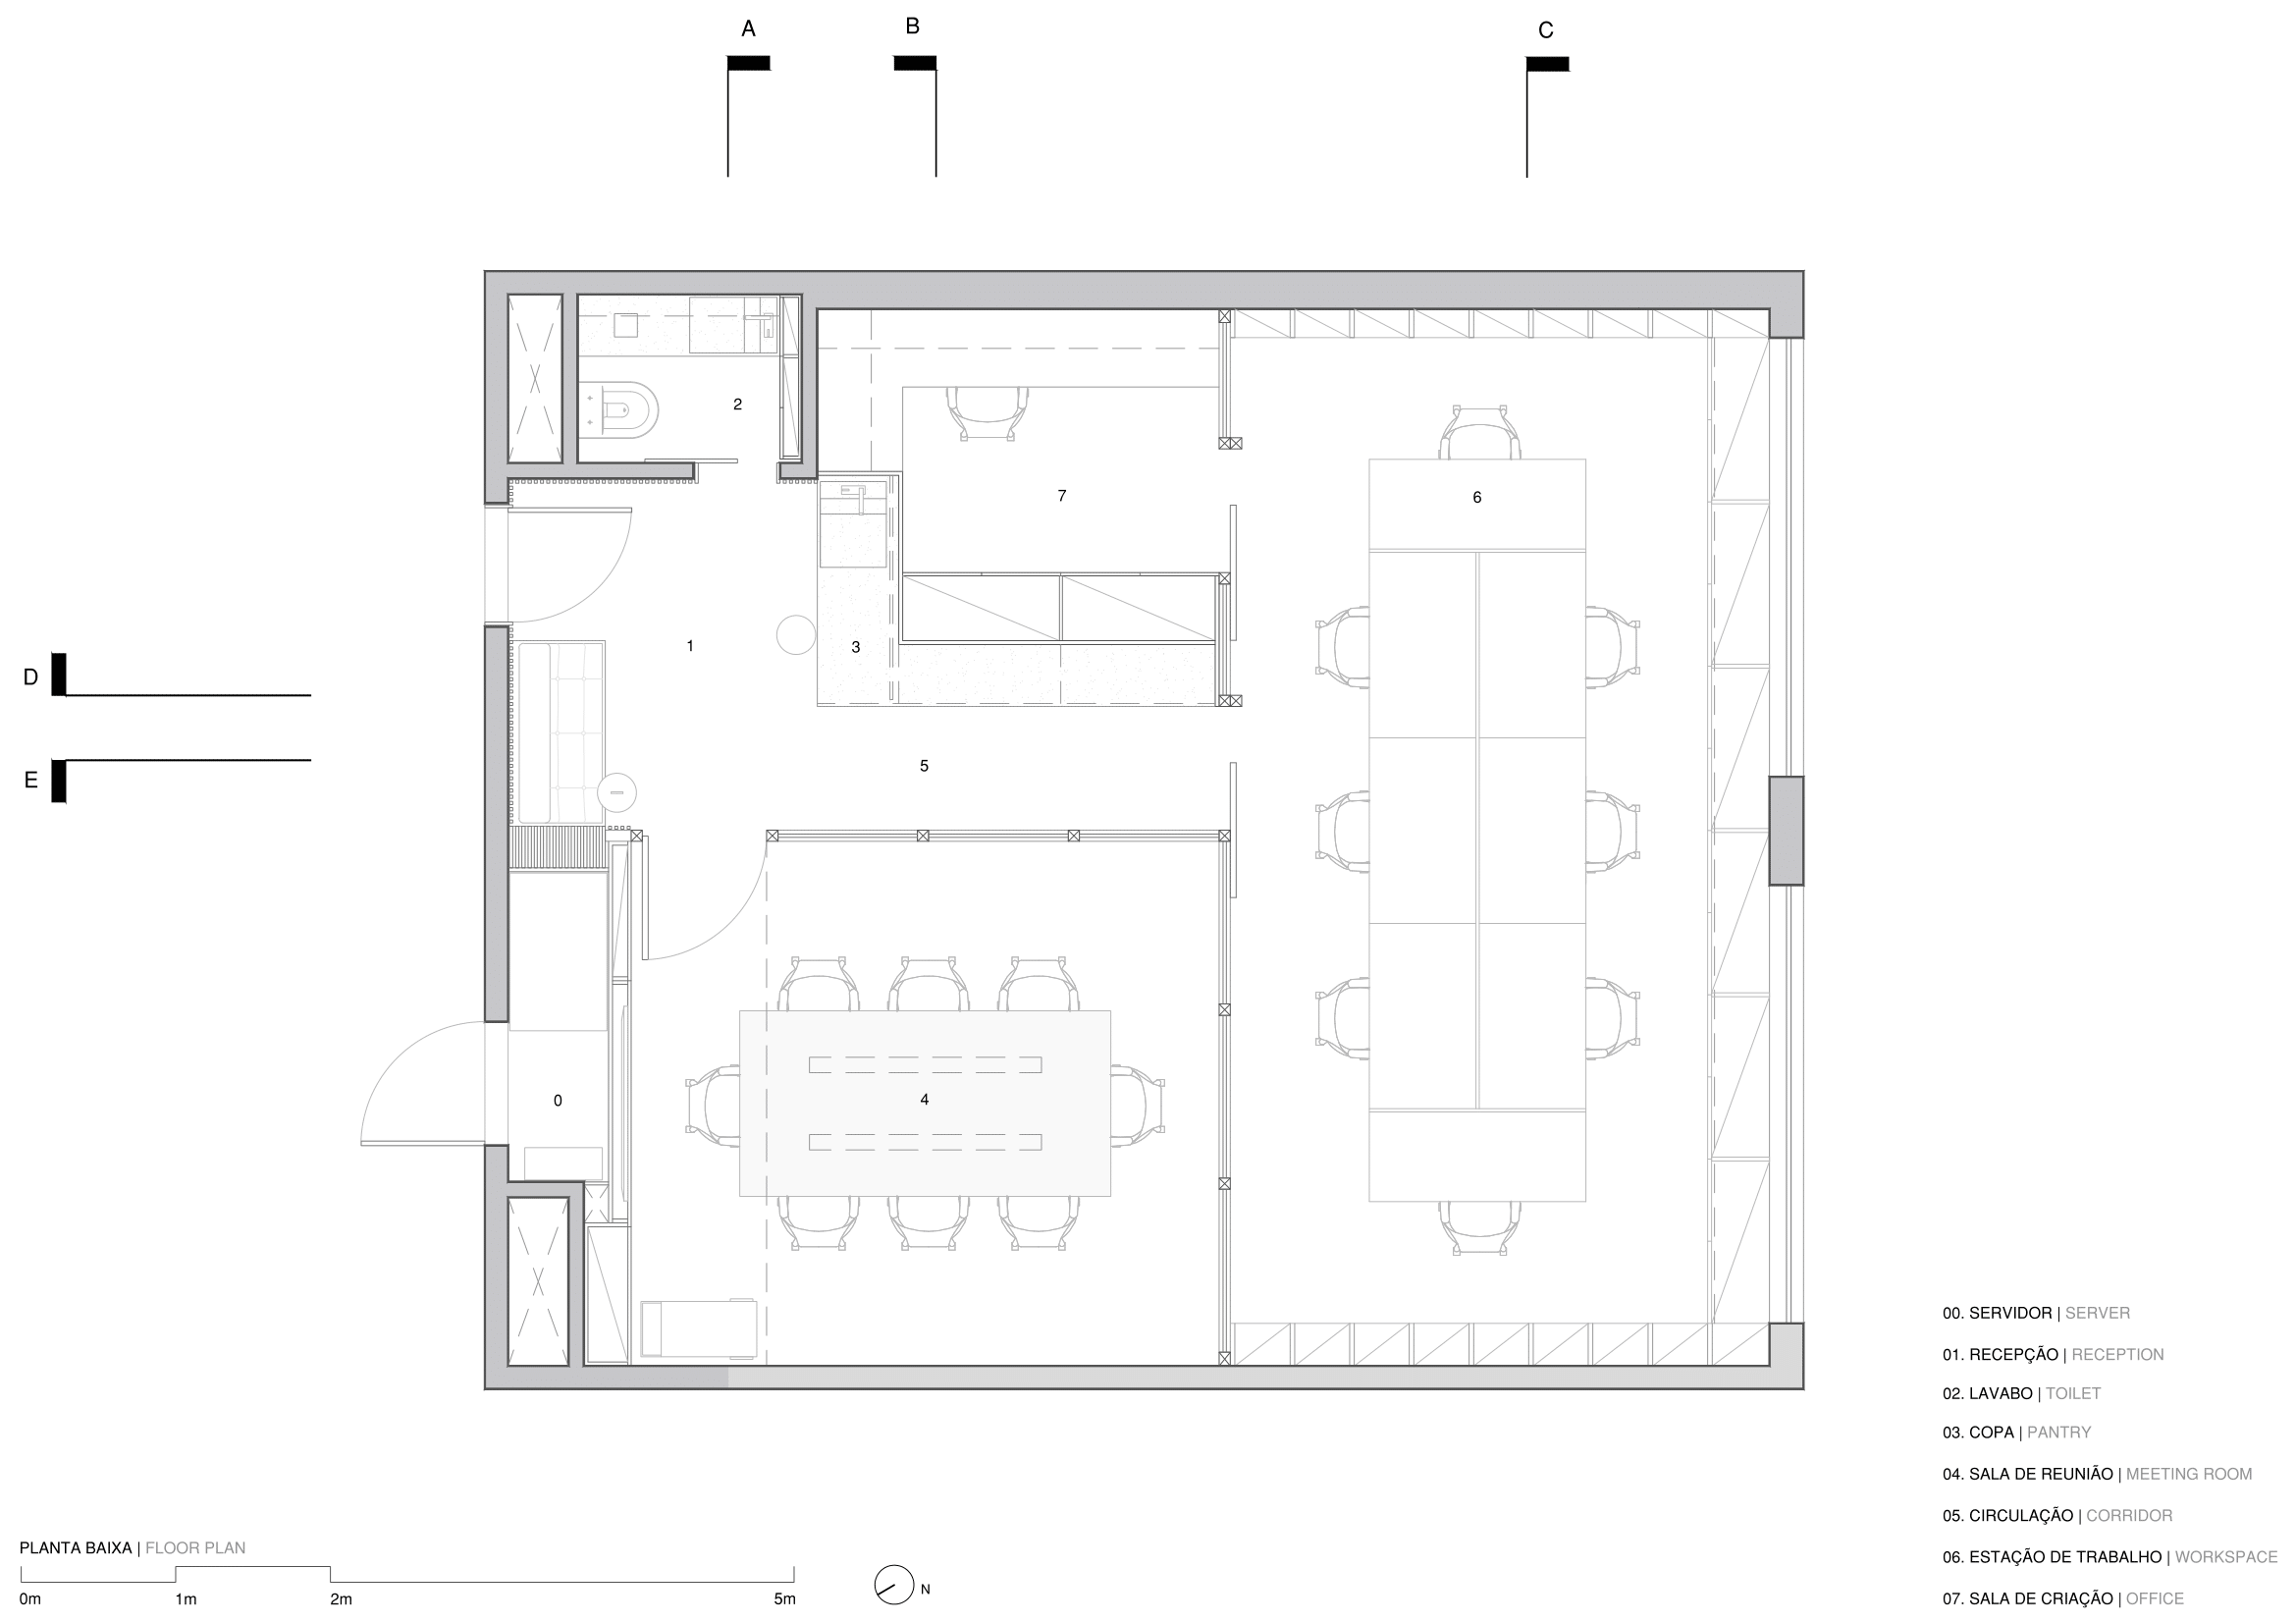 hobjeto-arquitetura-editora-zit-ap-01-pb